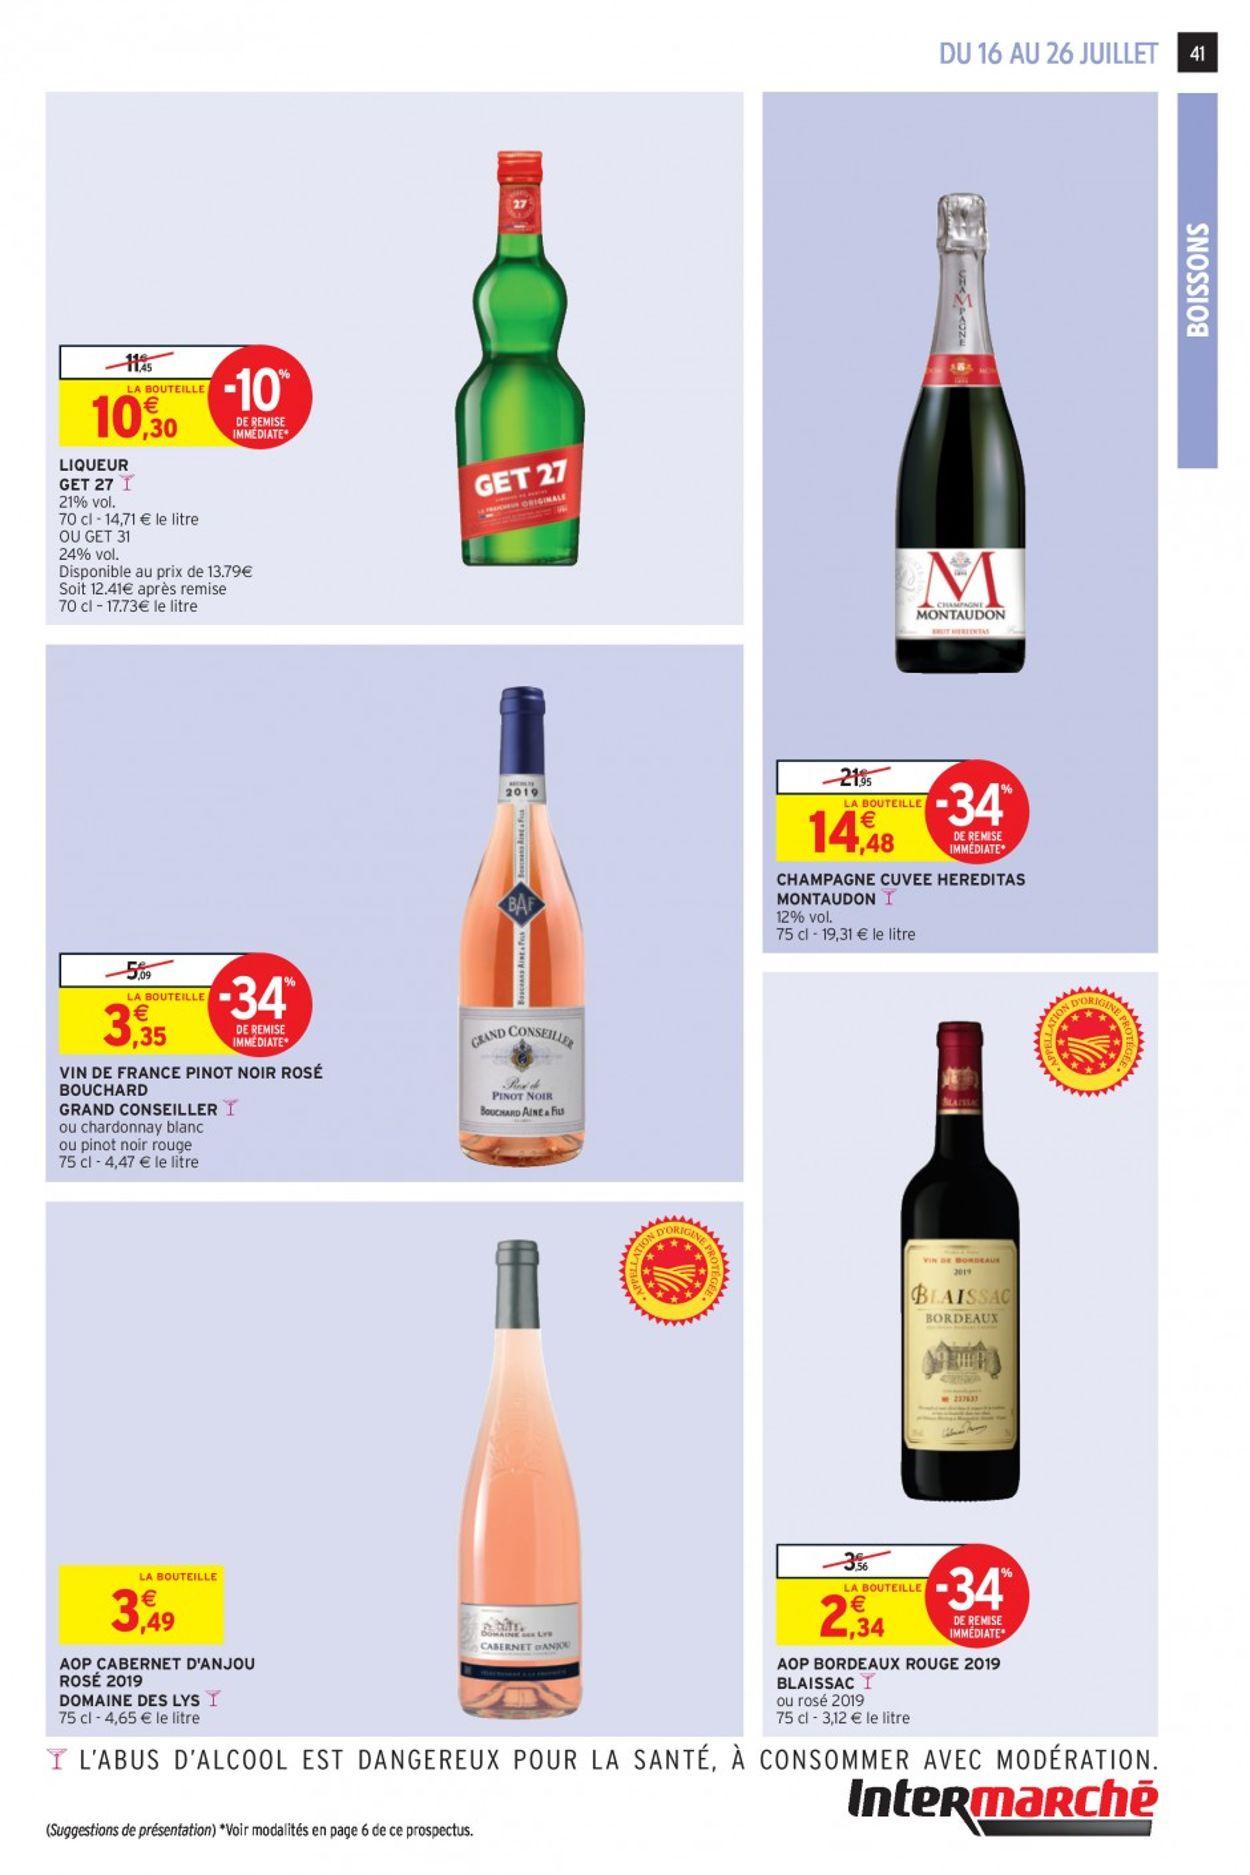 Intermarché Catalogue - 16.07-26.07.2020 (Page 39)